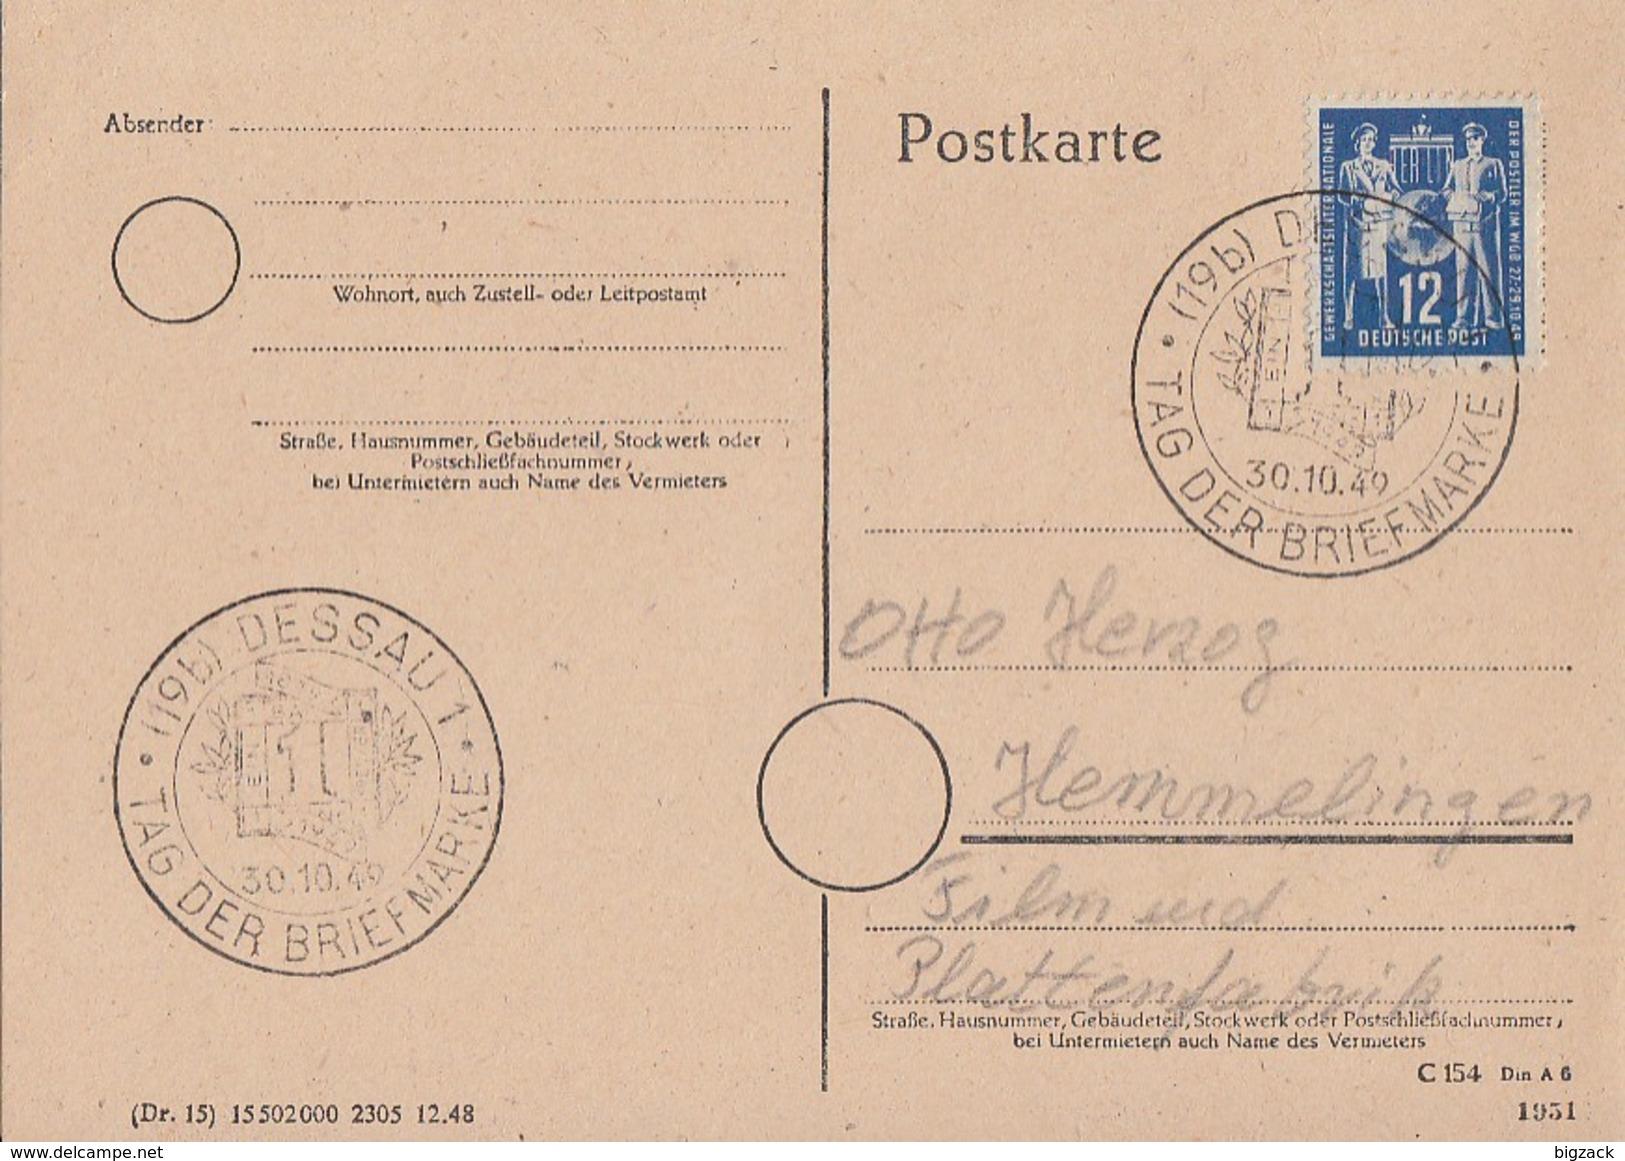 DDR Karte EF Minr.243 SST Dessau 30.10.49 - Briefe U. Dokumente